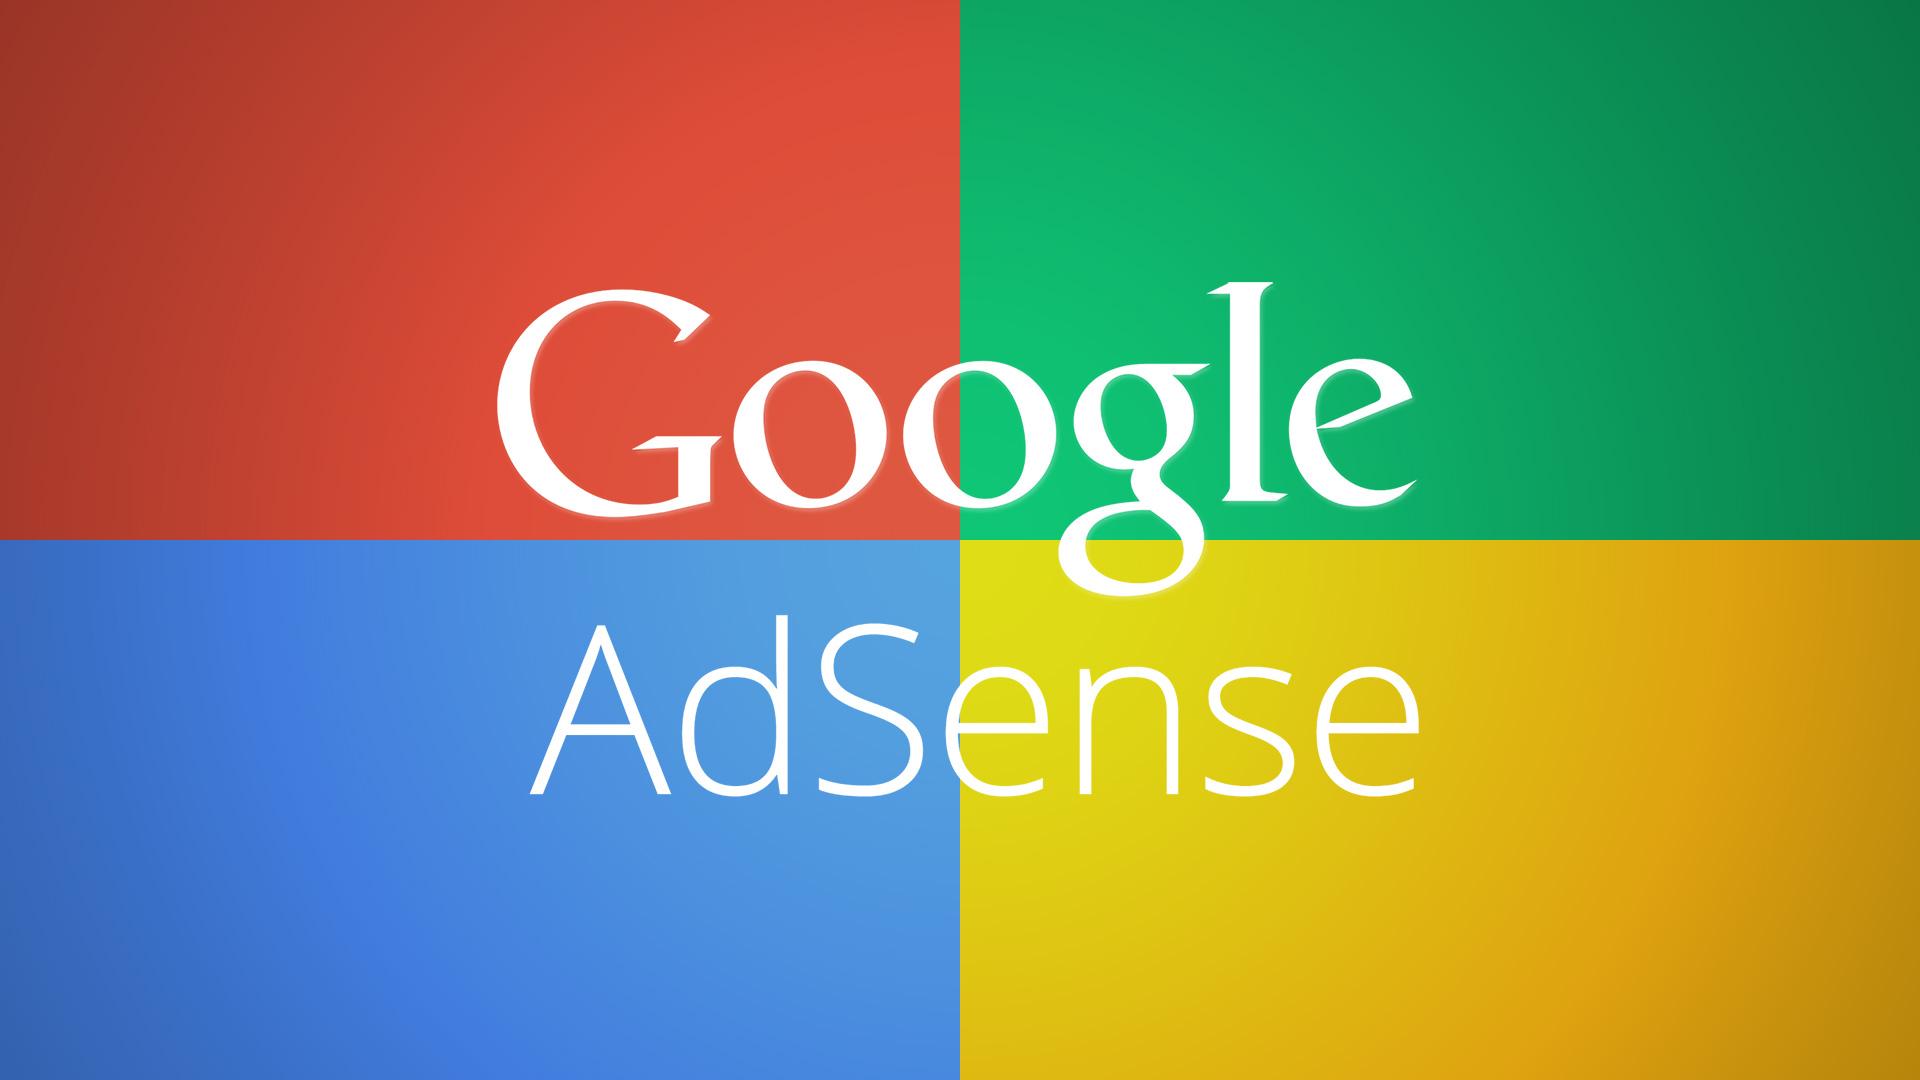 google-adsense-logo-1920.jpg